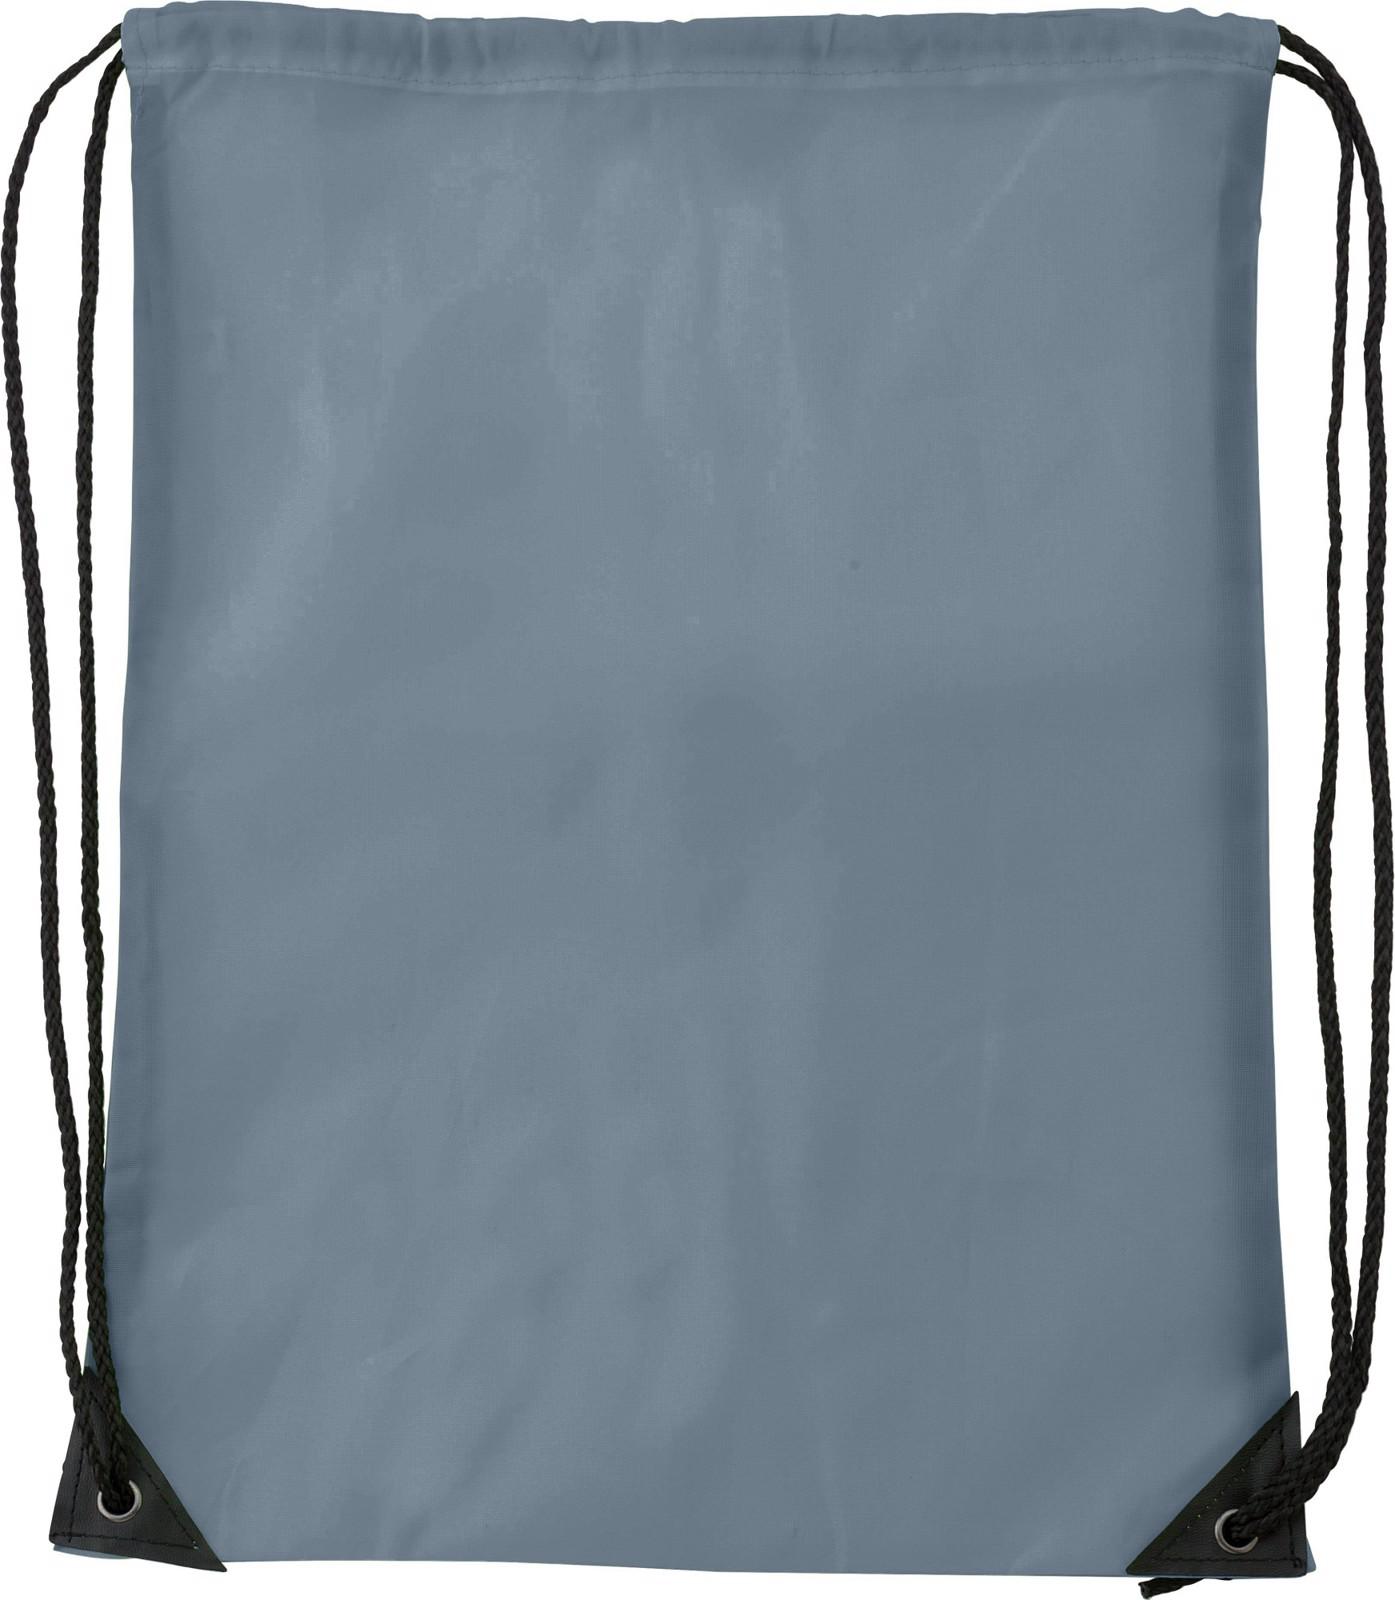 Polyester (210D) drawstring backpack - Grey